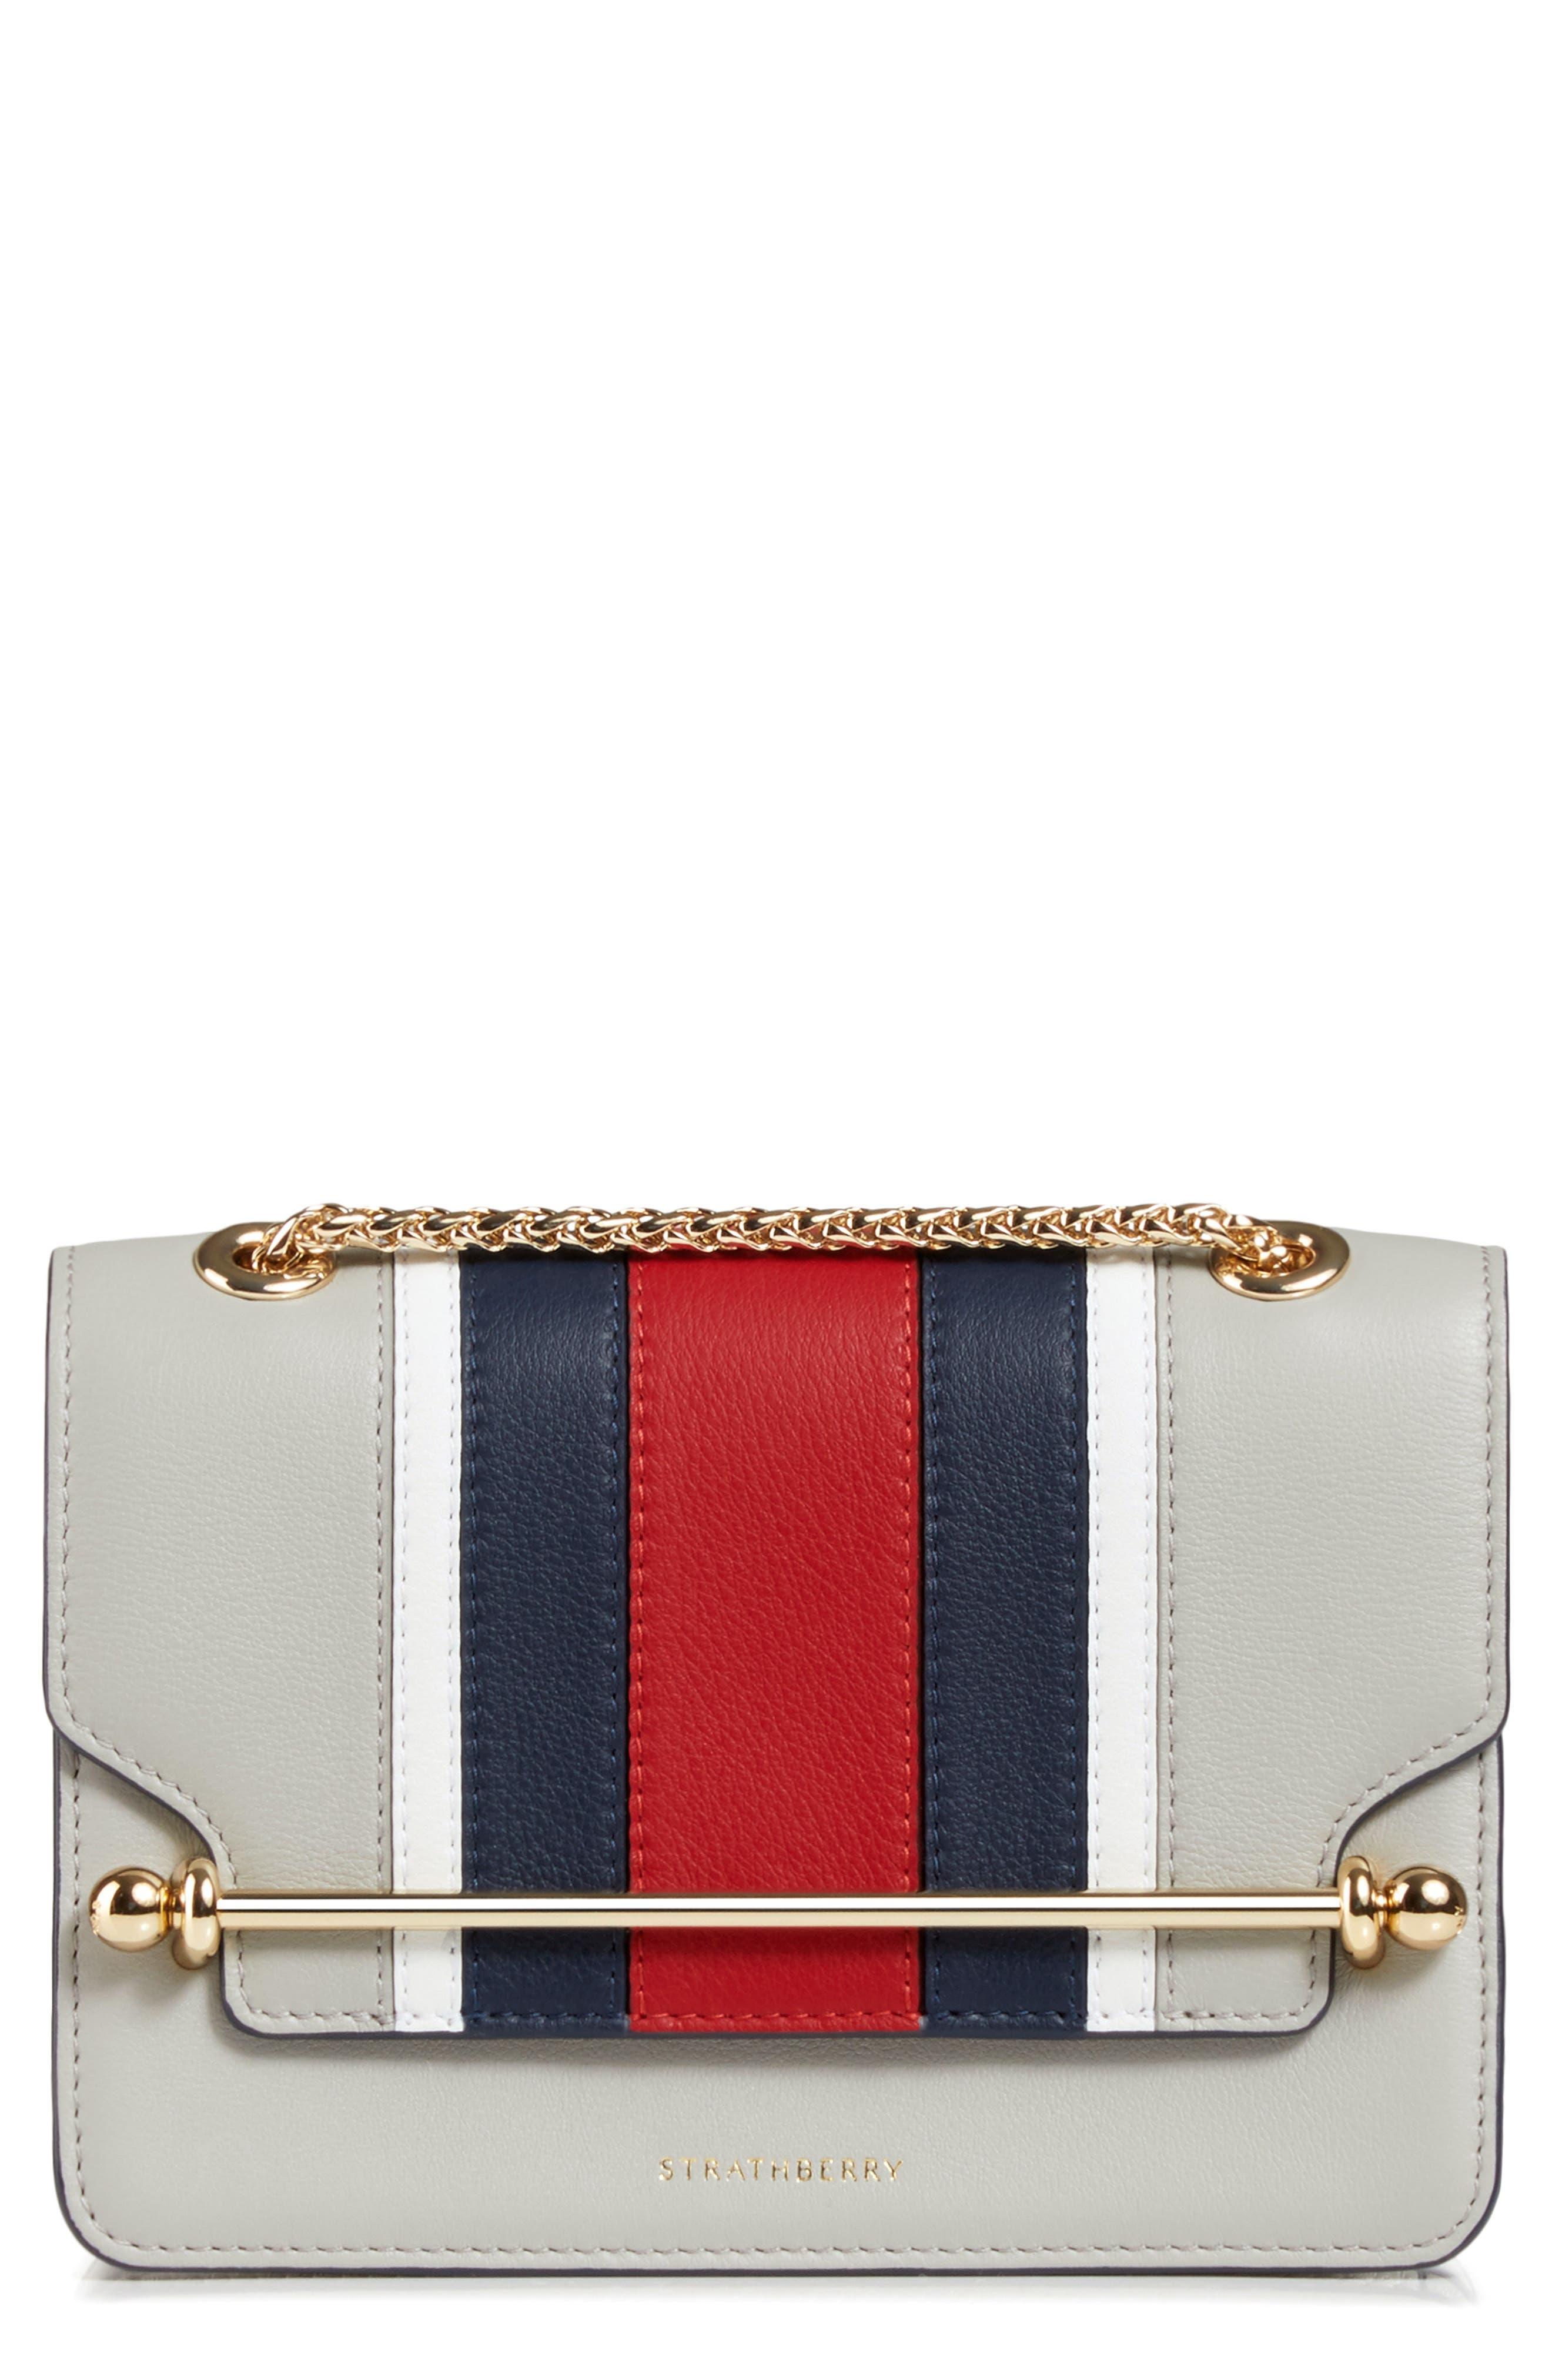 STRATHBERRY Mini East/West Stripe Leather Crossbody Bag - Grey in Pearl Grey